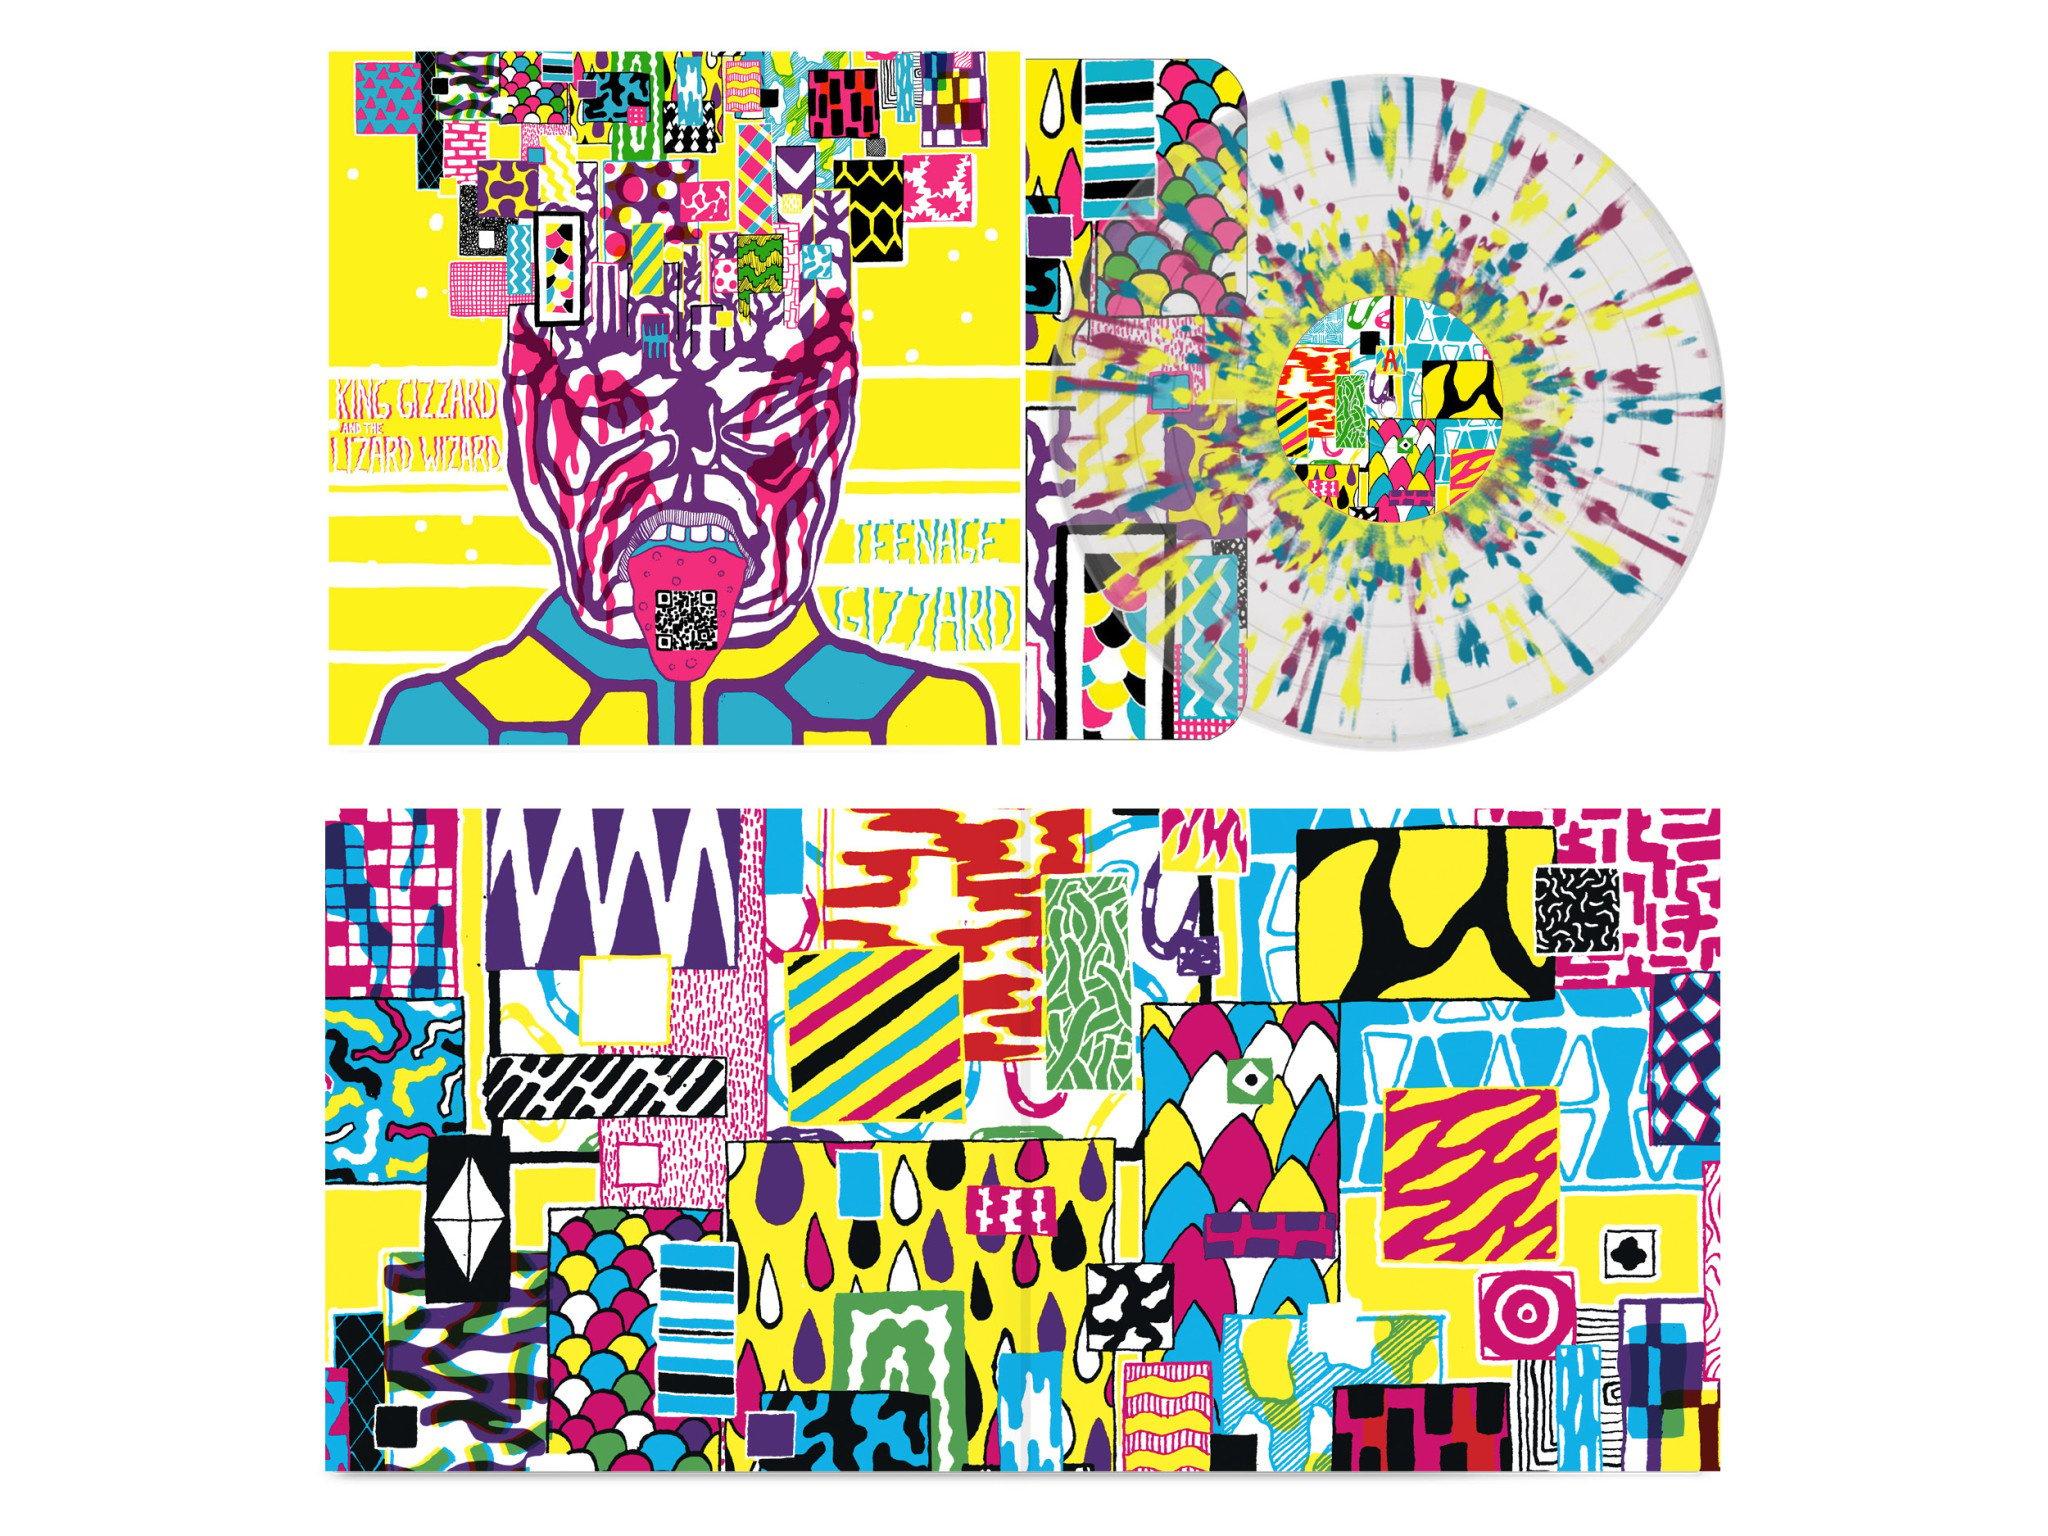 Fuzz Club Records King Gizzard & The Lizard Wizard - Teenage Gizzard (Splatter Vinyl)